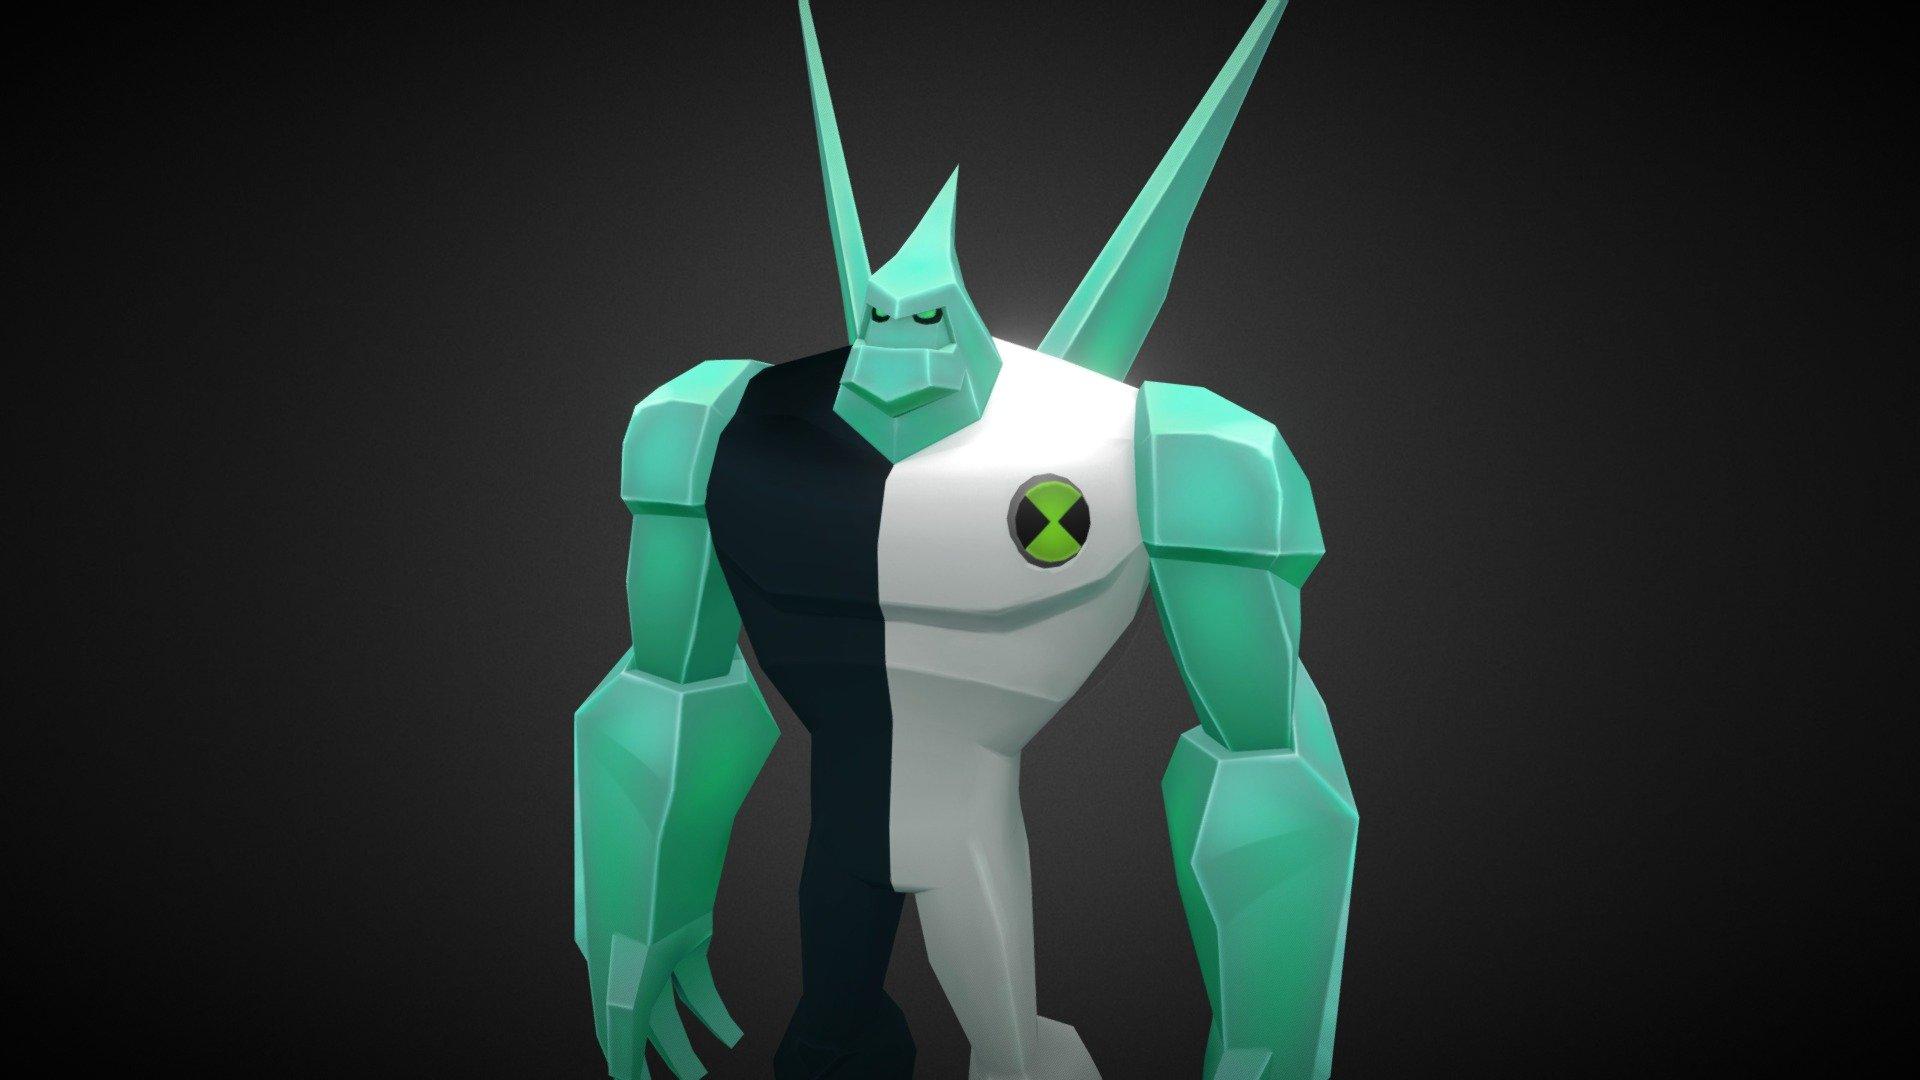 Diamondhead - Ben 10 - Download Free 3D model by thanhtp ...